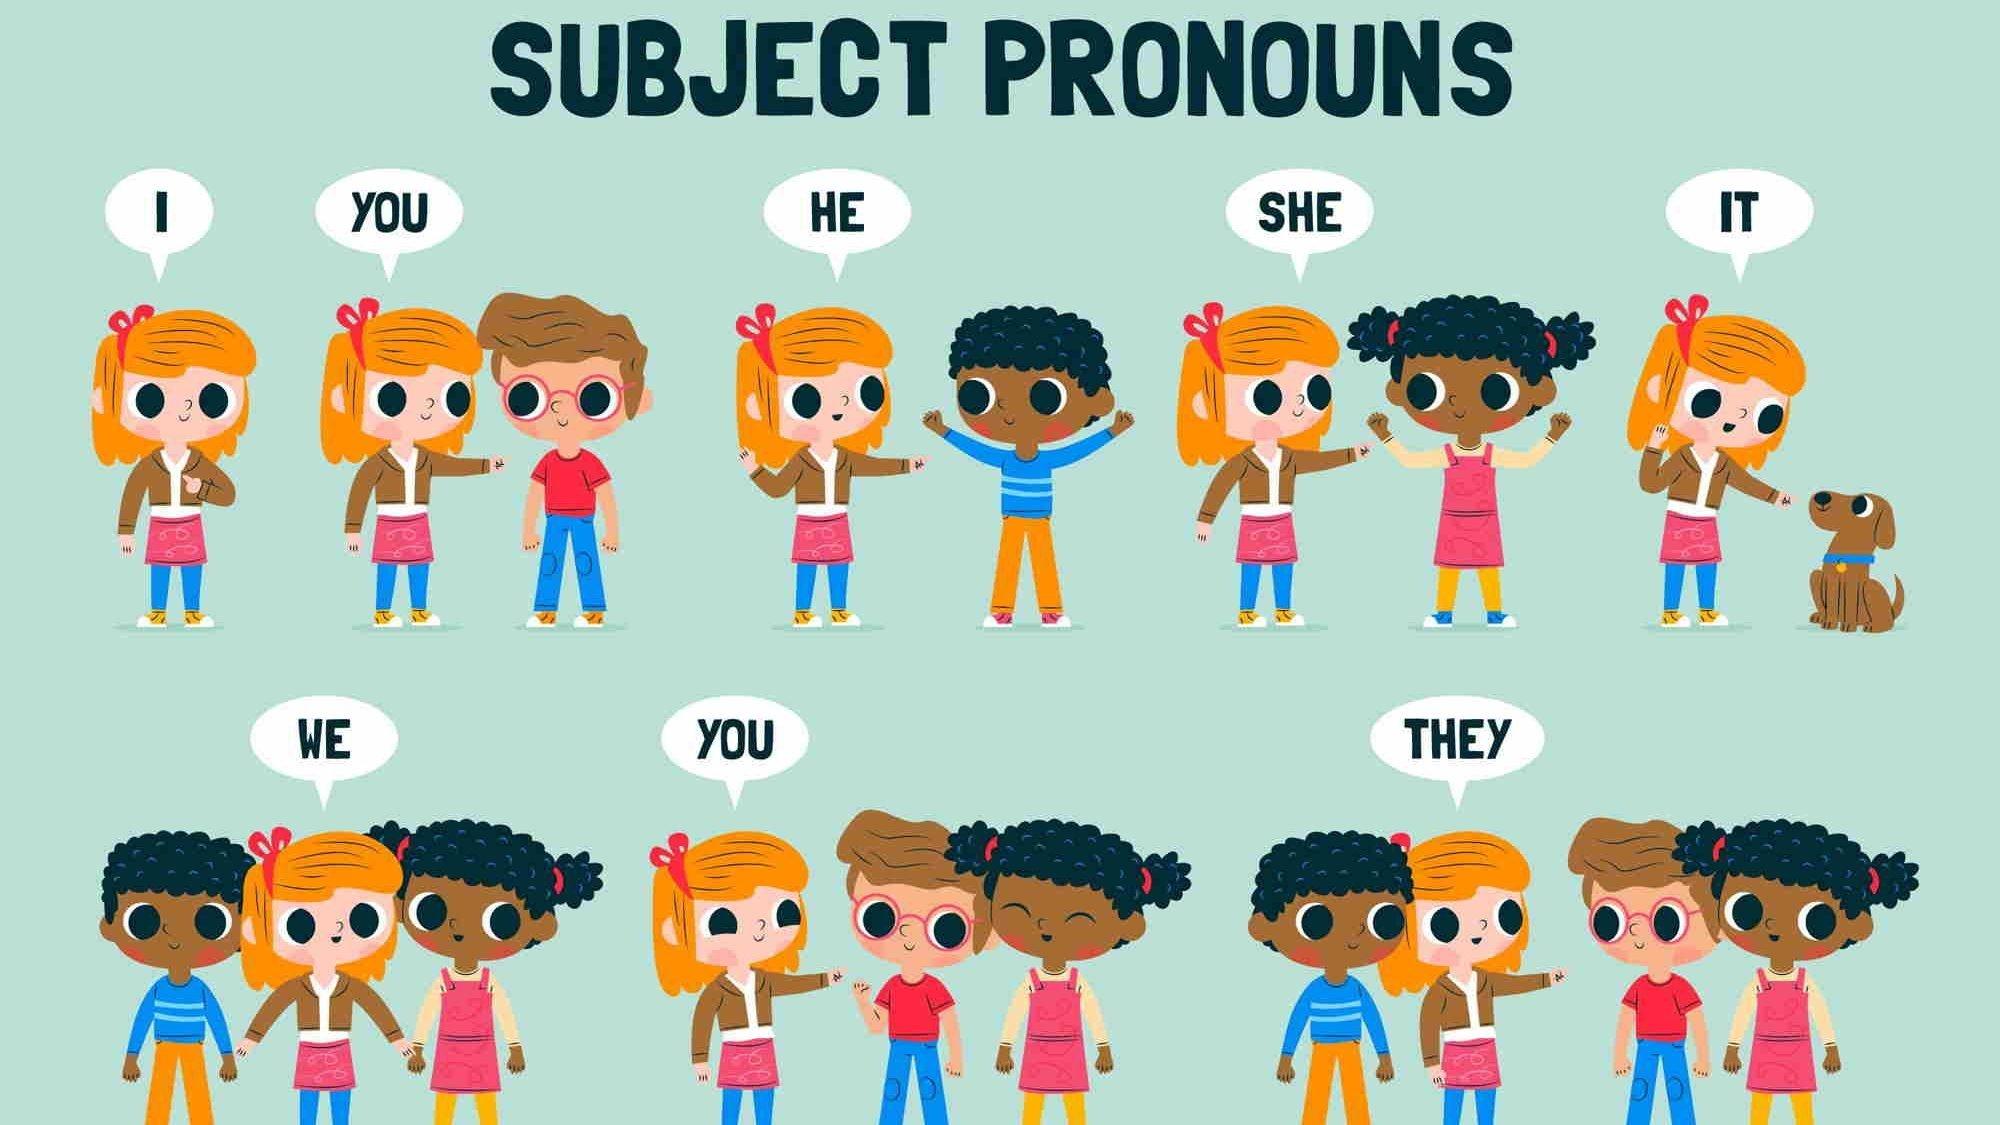 Pronombre inglés dibujo subject pronouns